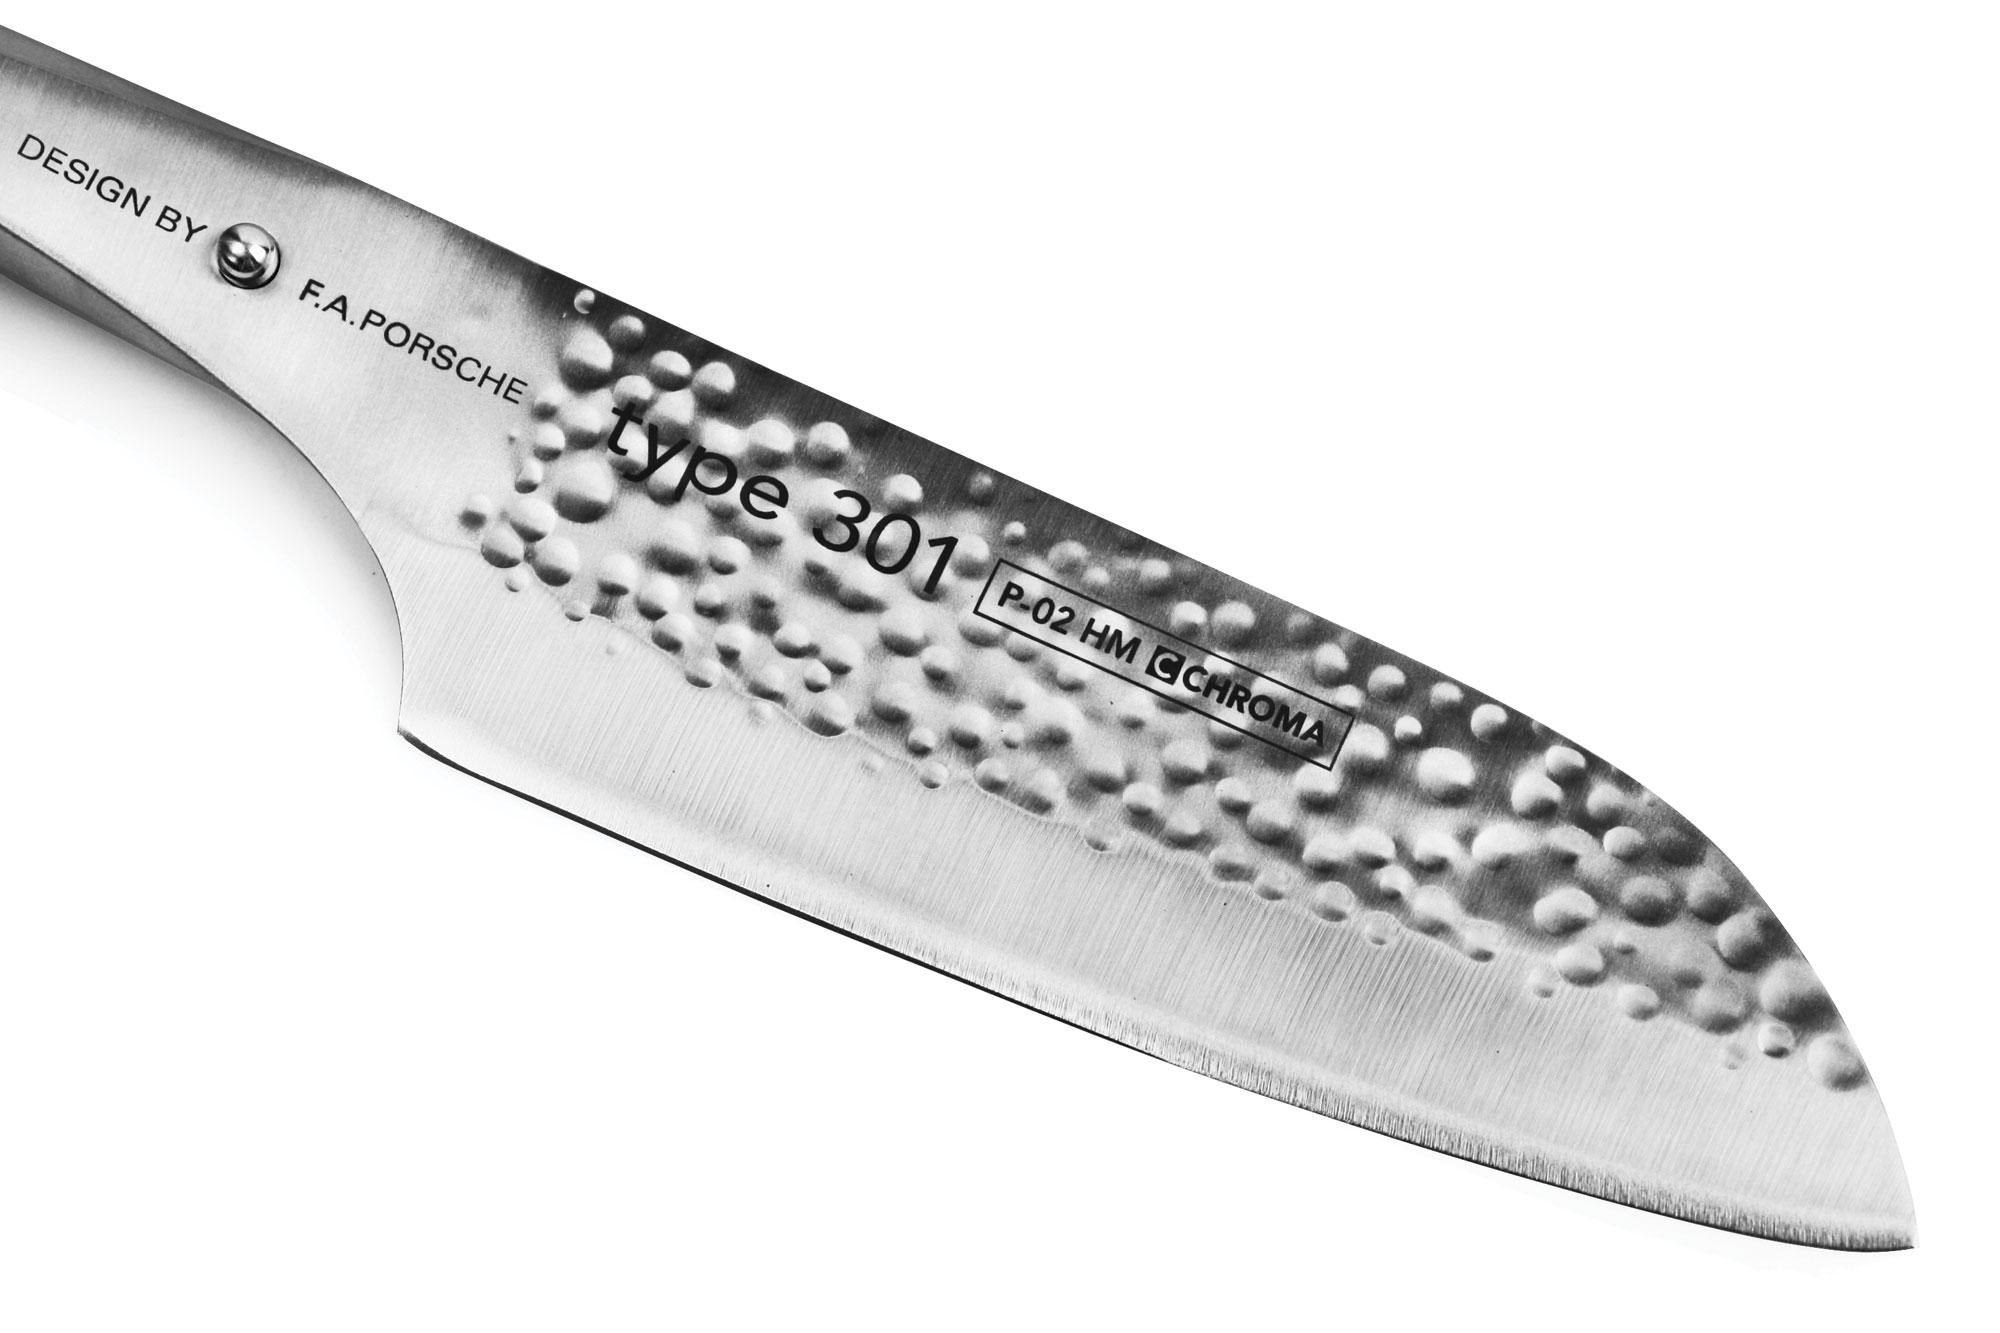 "Chroma P02 Type 301 Hammered Santoku Knife, 7.25"""